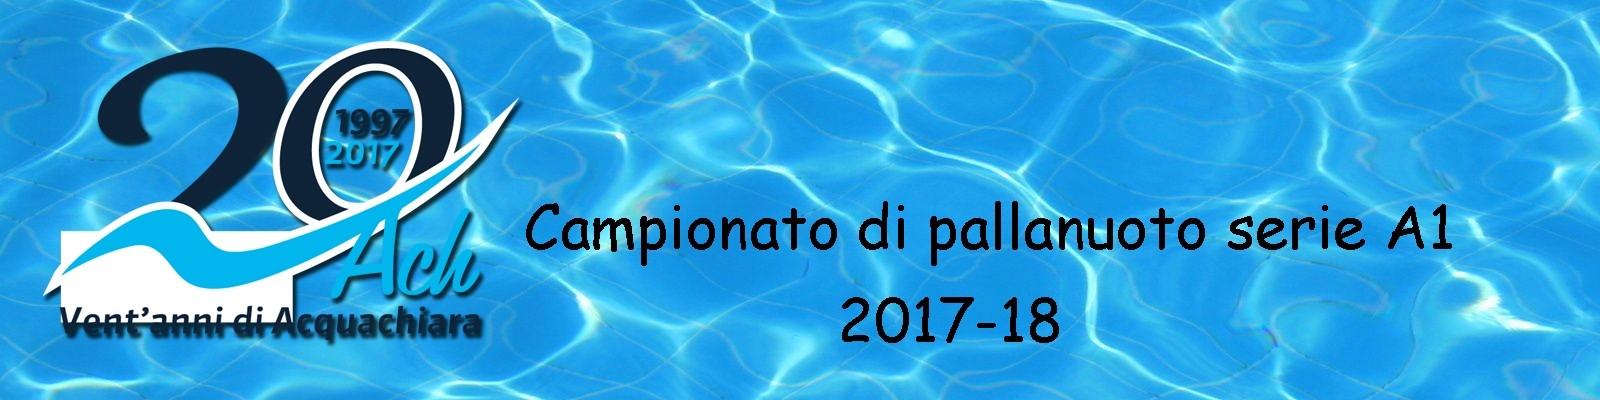 Acquachiara anno 2017-18